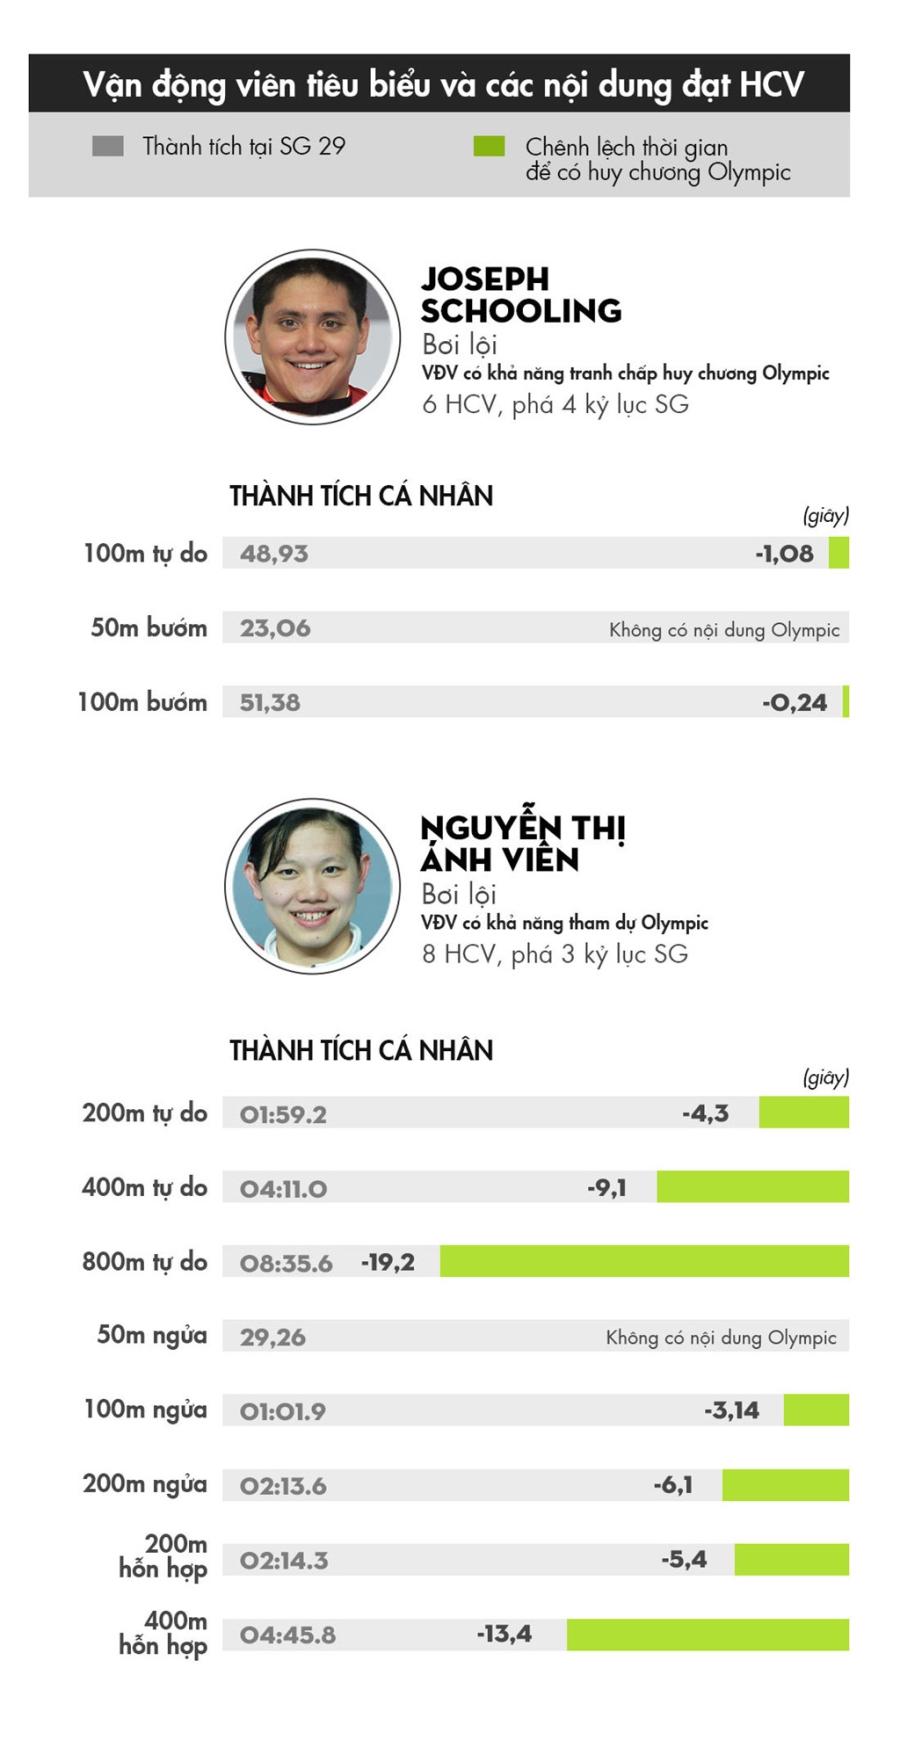 55 HCV cua Malaysia tai SEA Games 29 khong phai la noi dung Olympic hinh anh 3